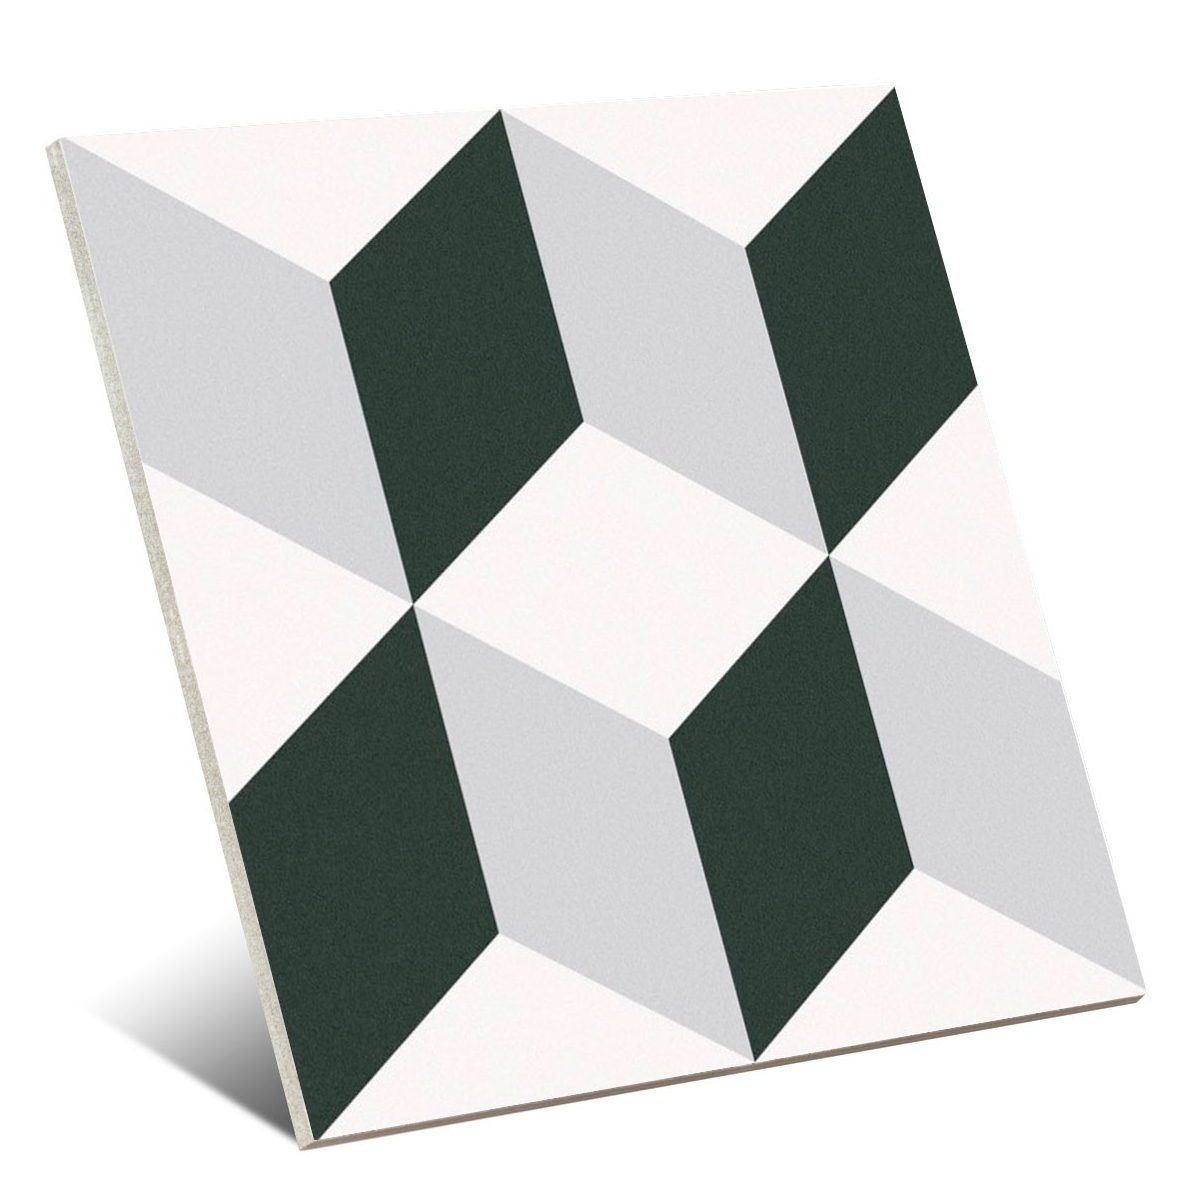 Barcelona Cube 25x25 (m2)